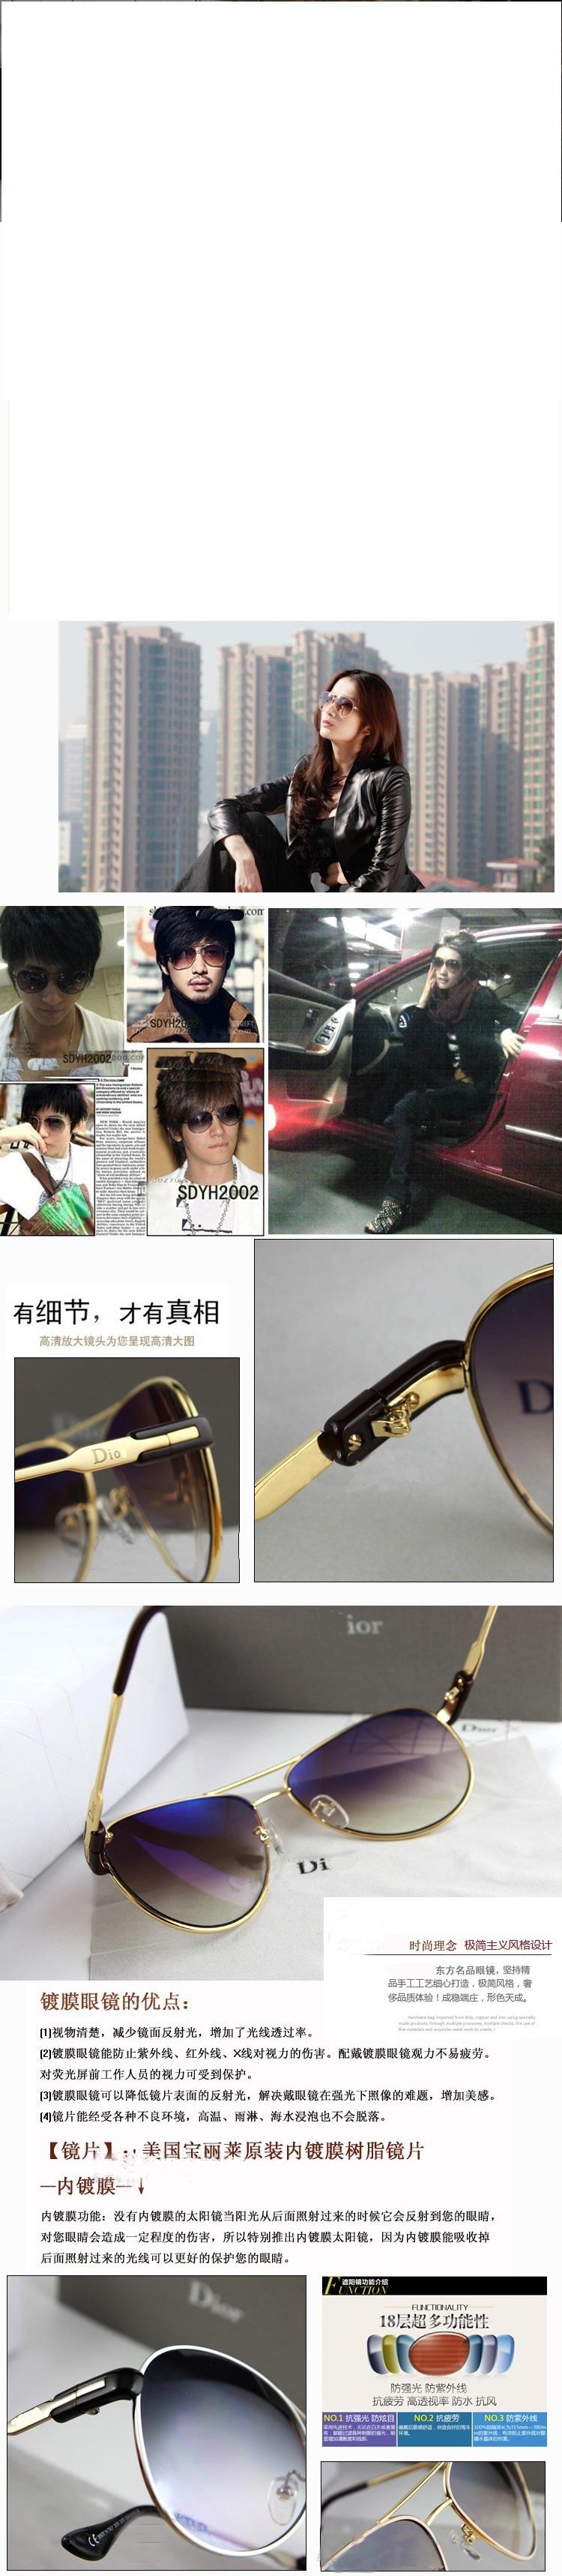 glasses just for fashion  fashion vintage